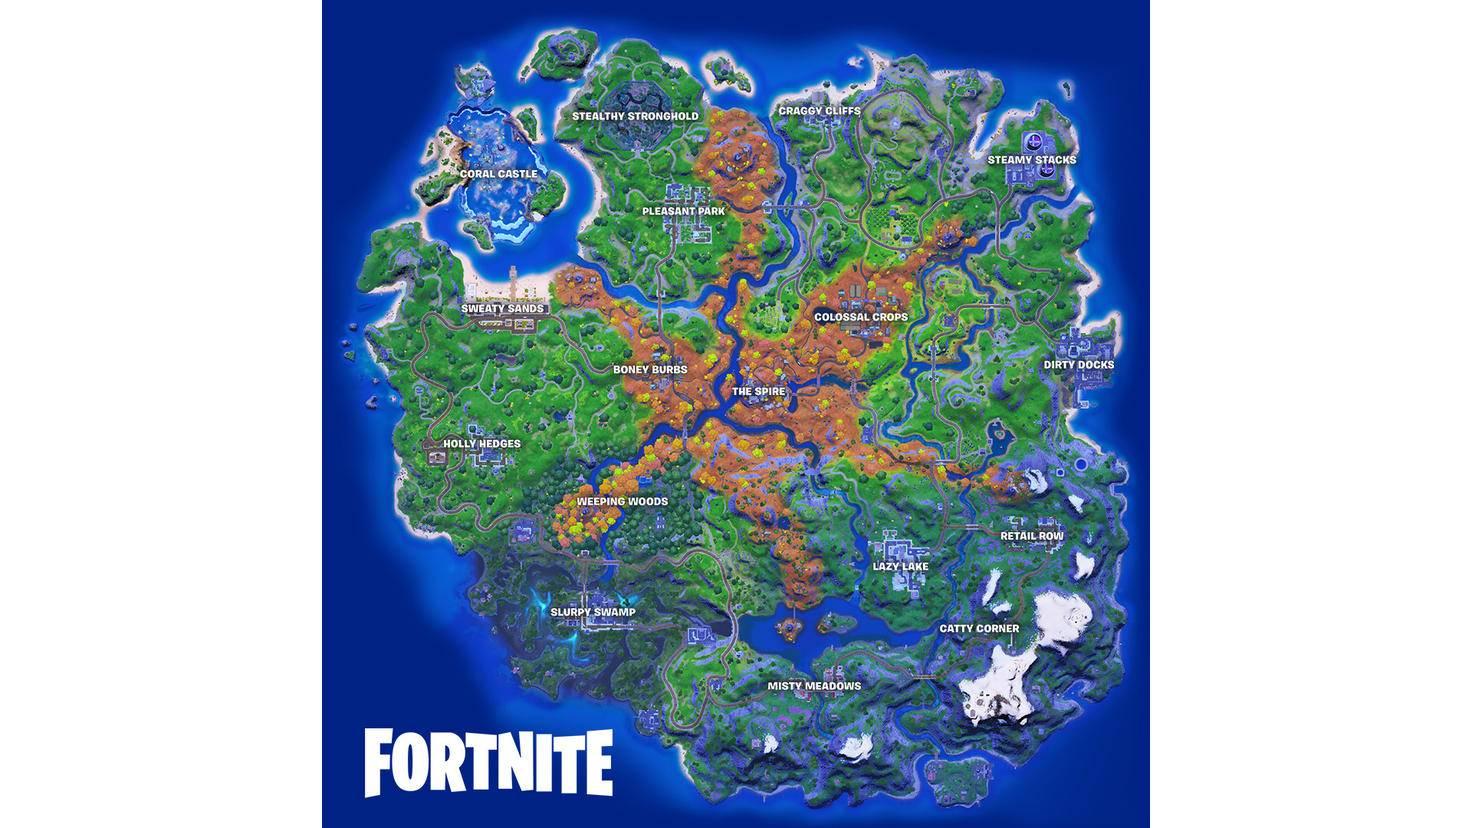 fortnite-season-6-map